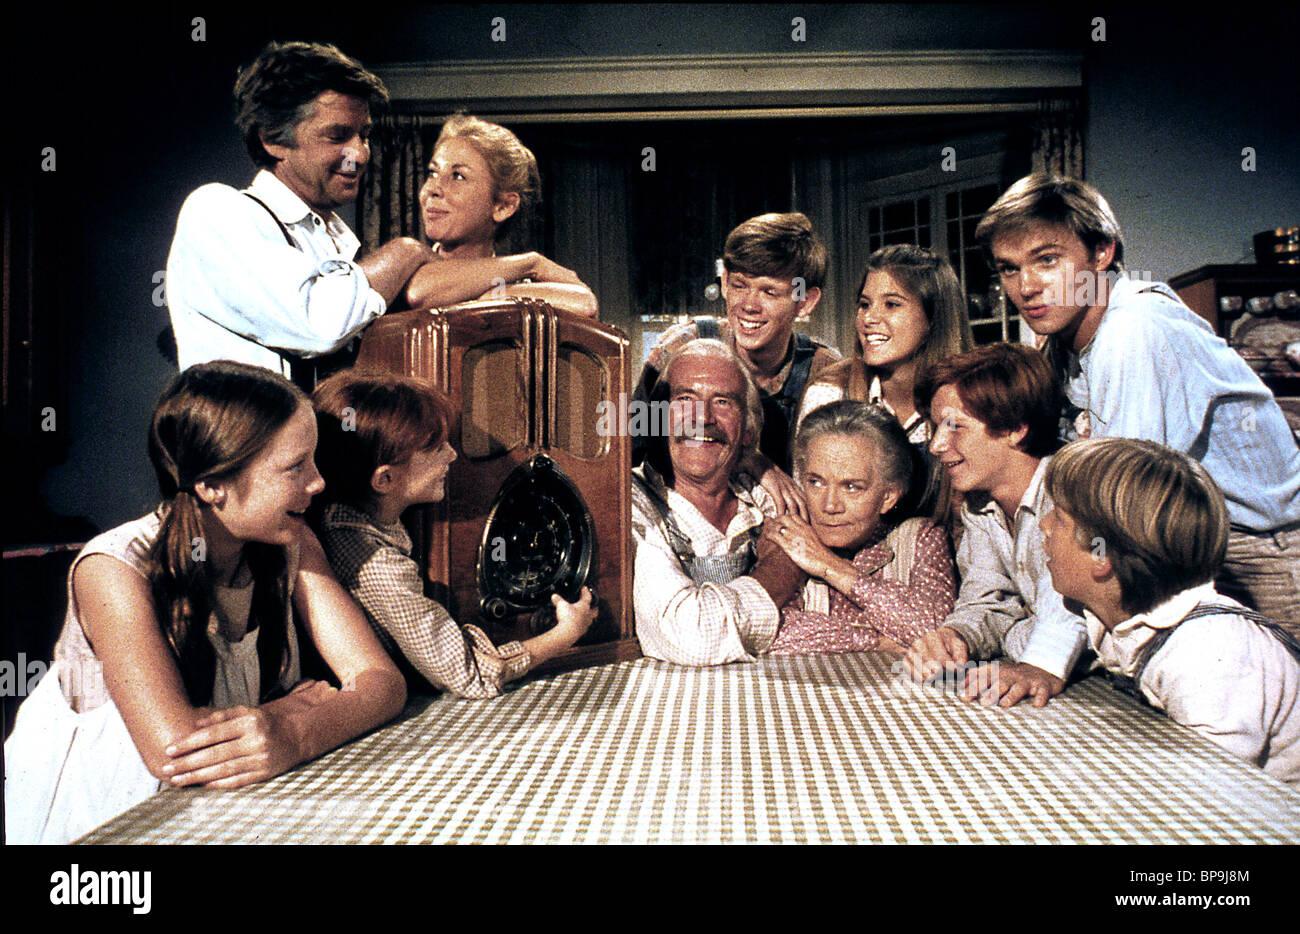 Monty Hall pics